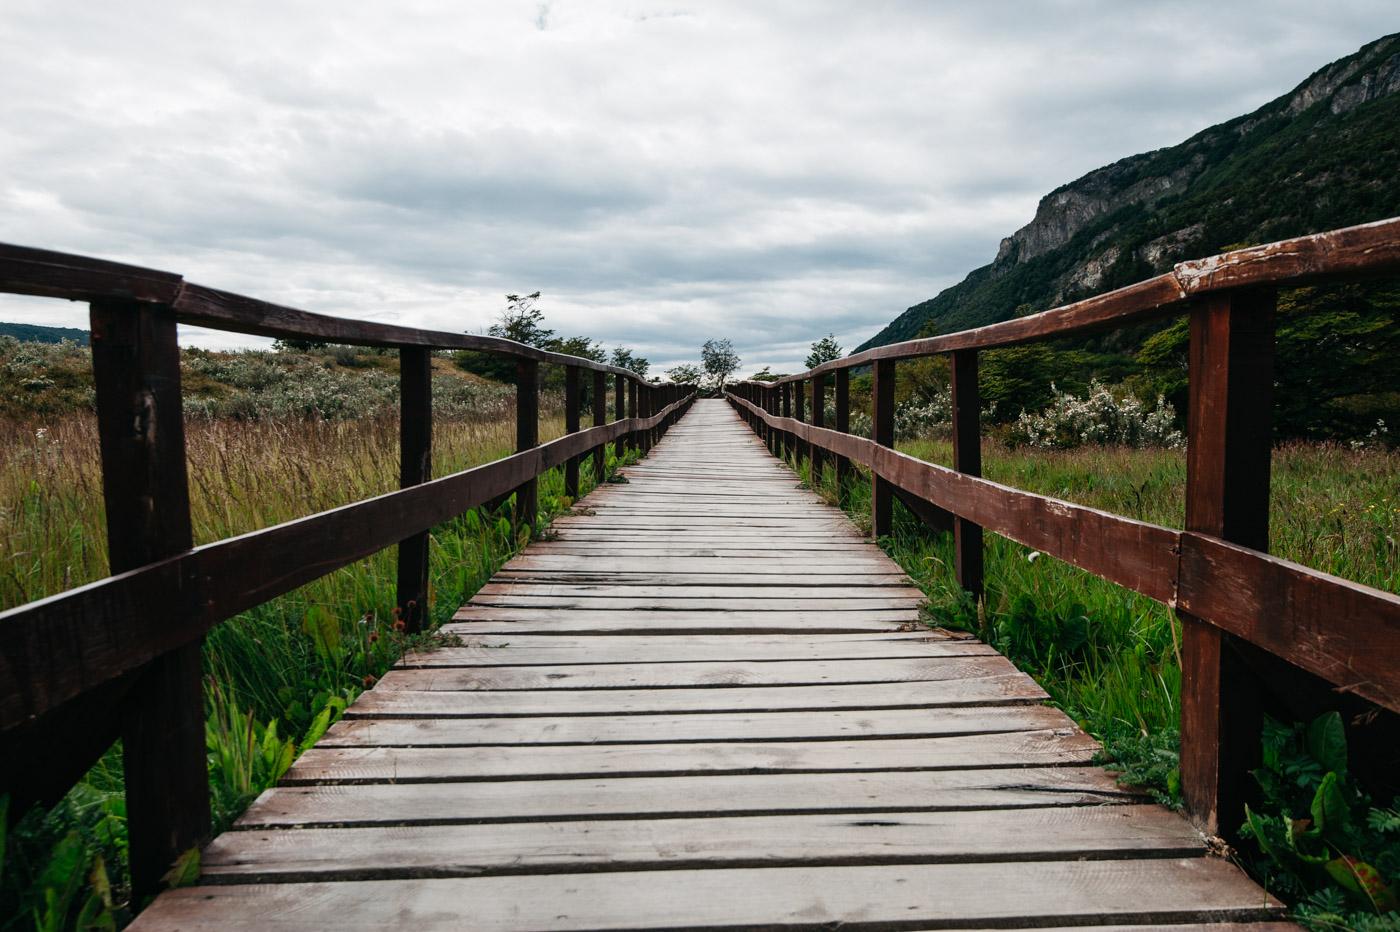 Argentina National Park Tierra del Fuego Beagle Channel Bahia Lapataia Walkway